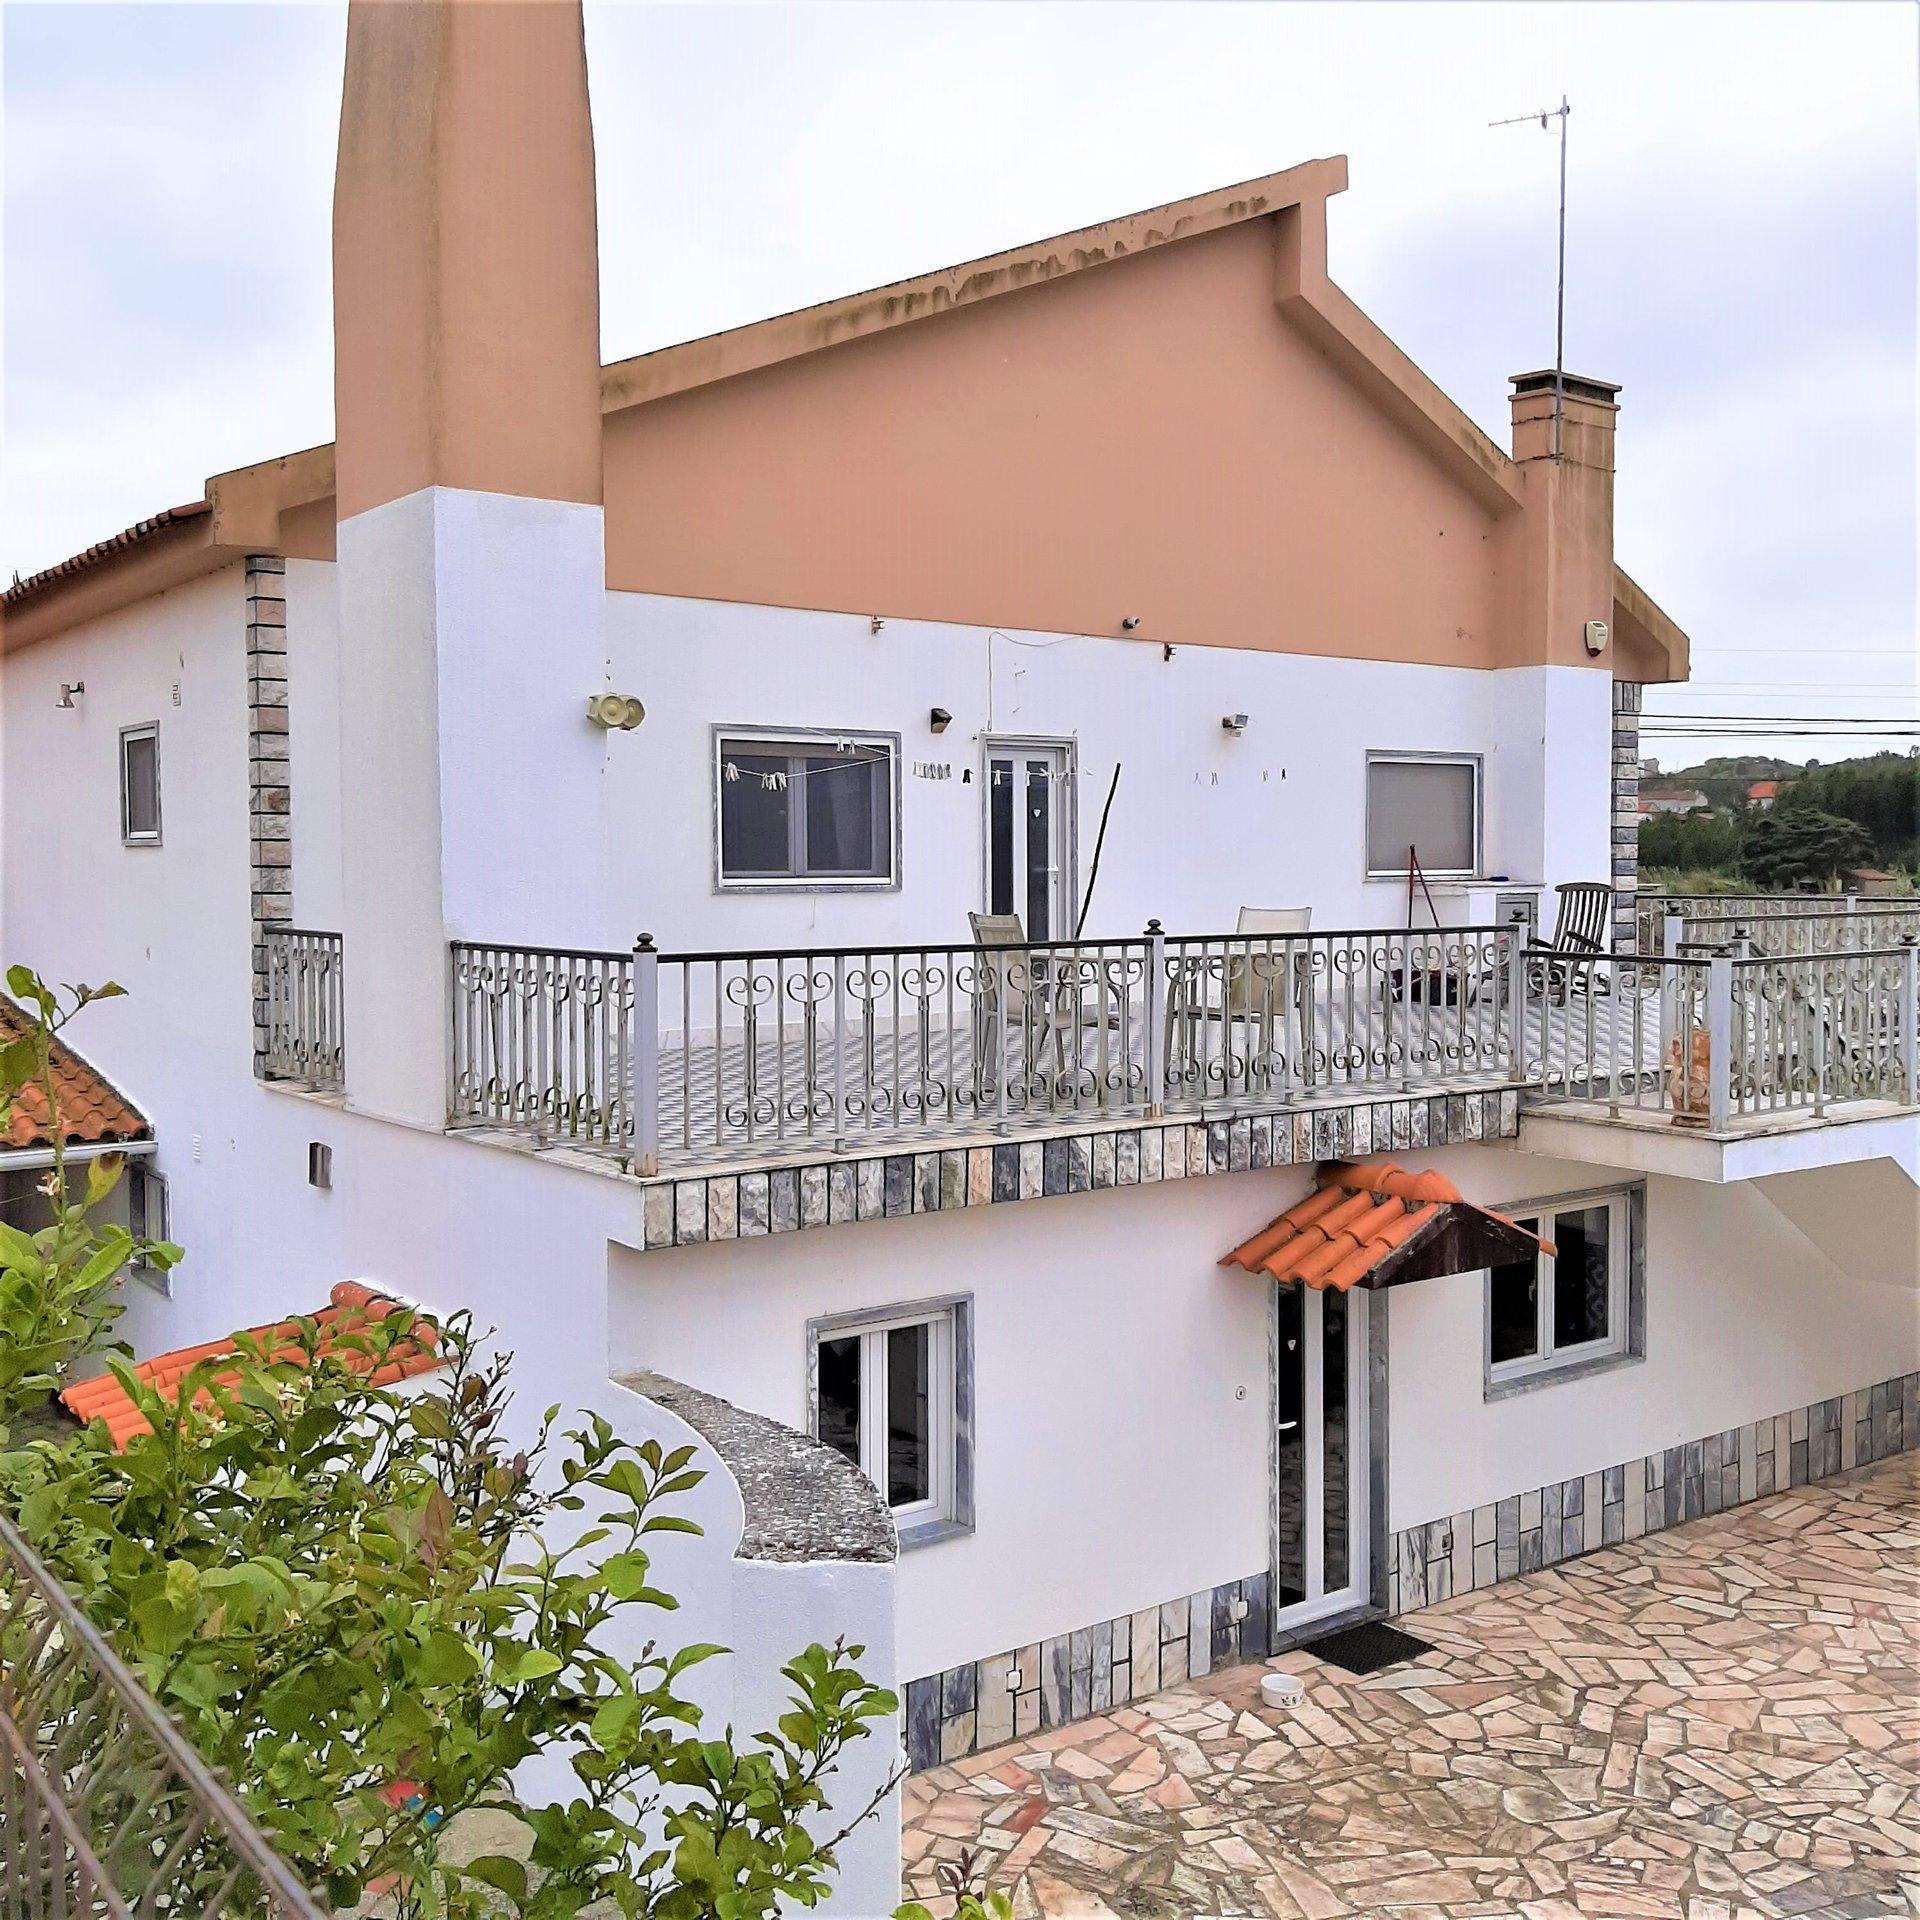 4 Bedroom House Serra Do Bouro, Silver Coast Ref: AV2054